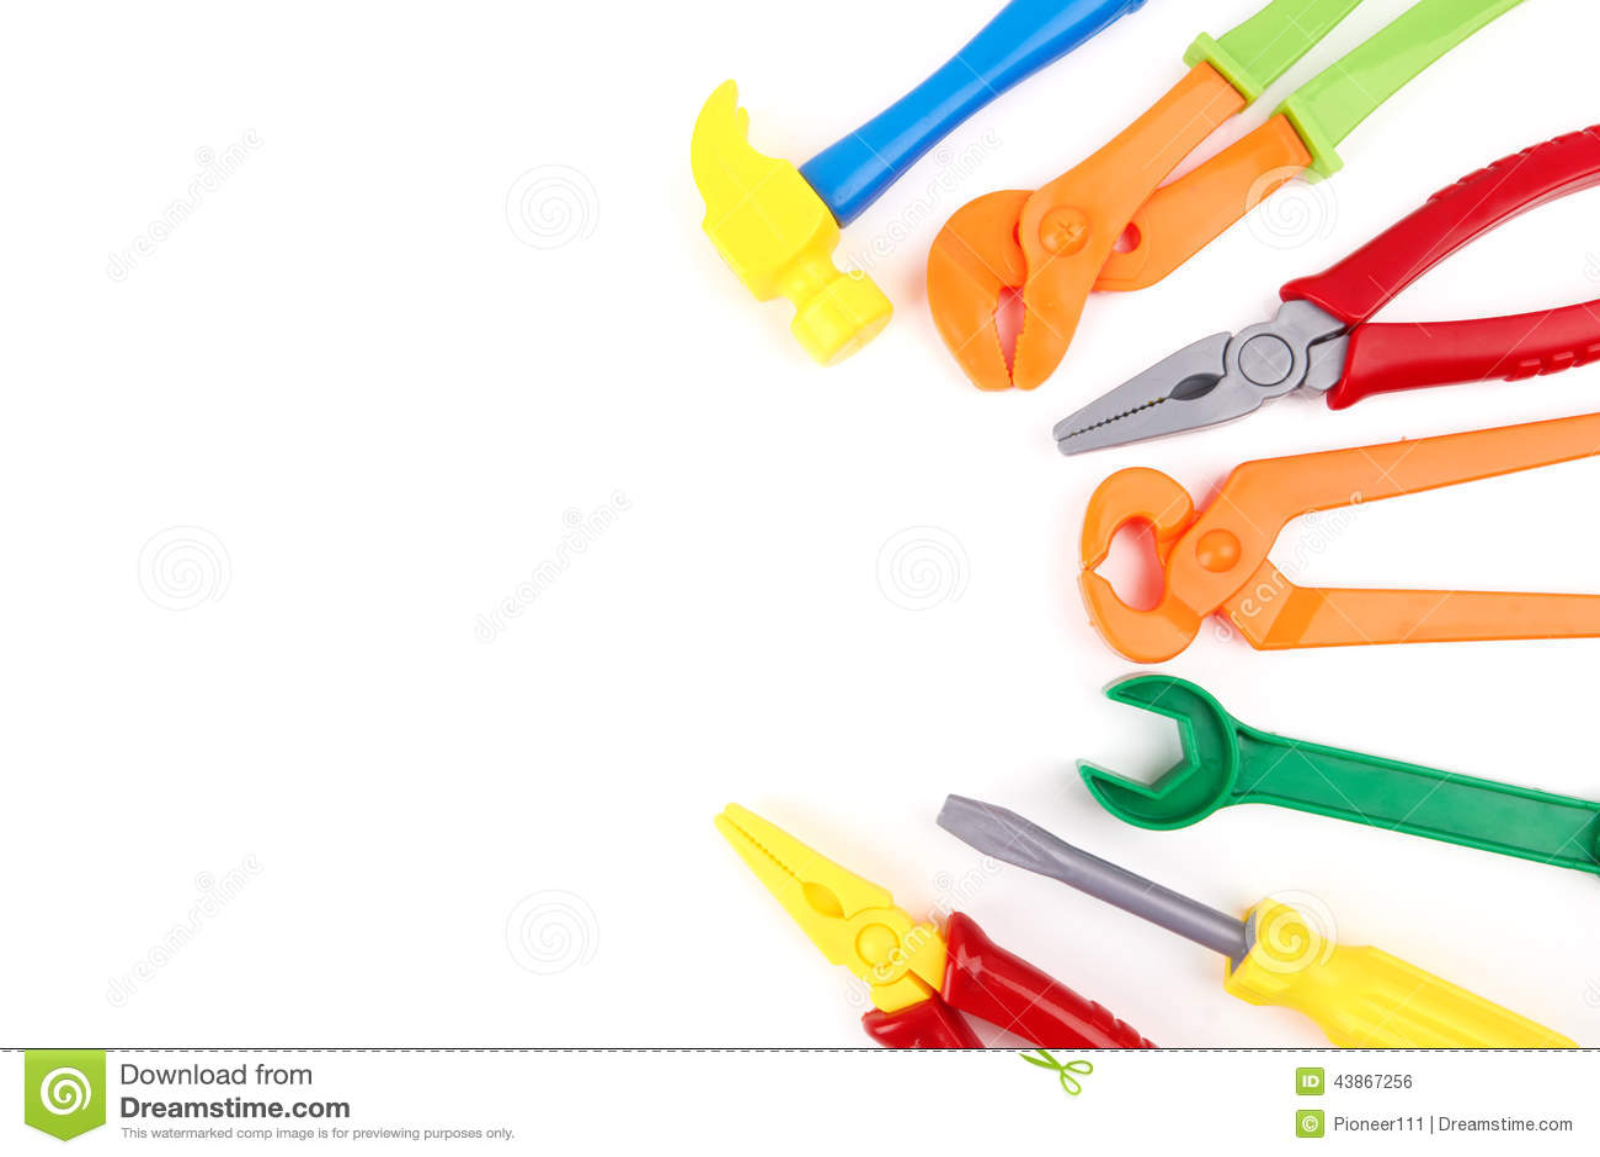 Plastic Toy Tools : Toy tools stock photo image